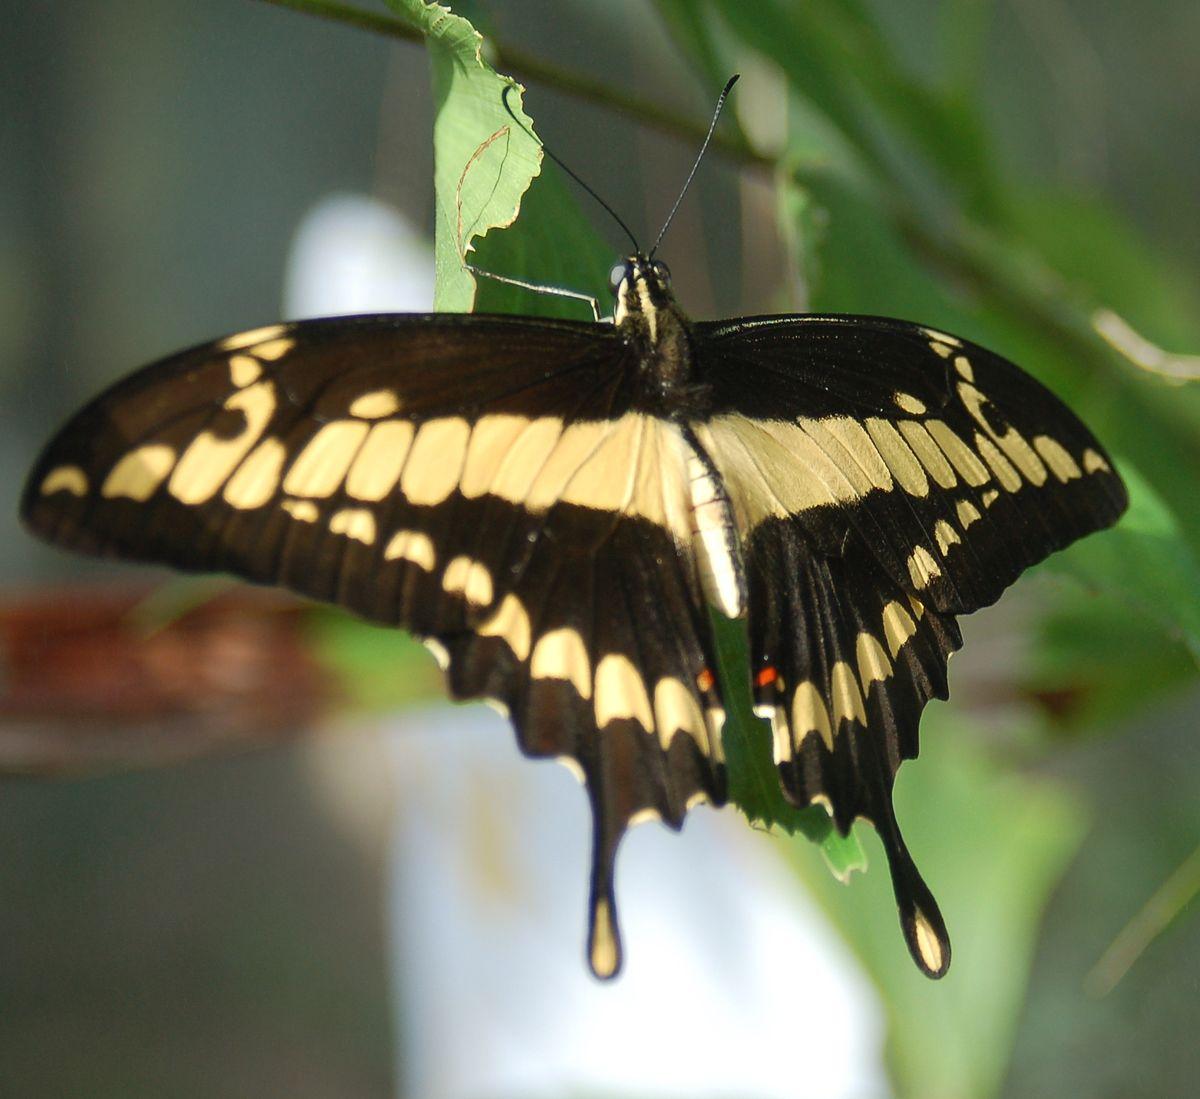 Alas de mariposa - 4 5